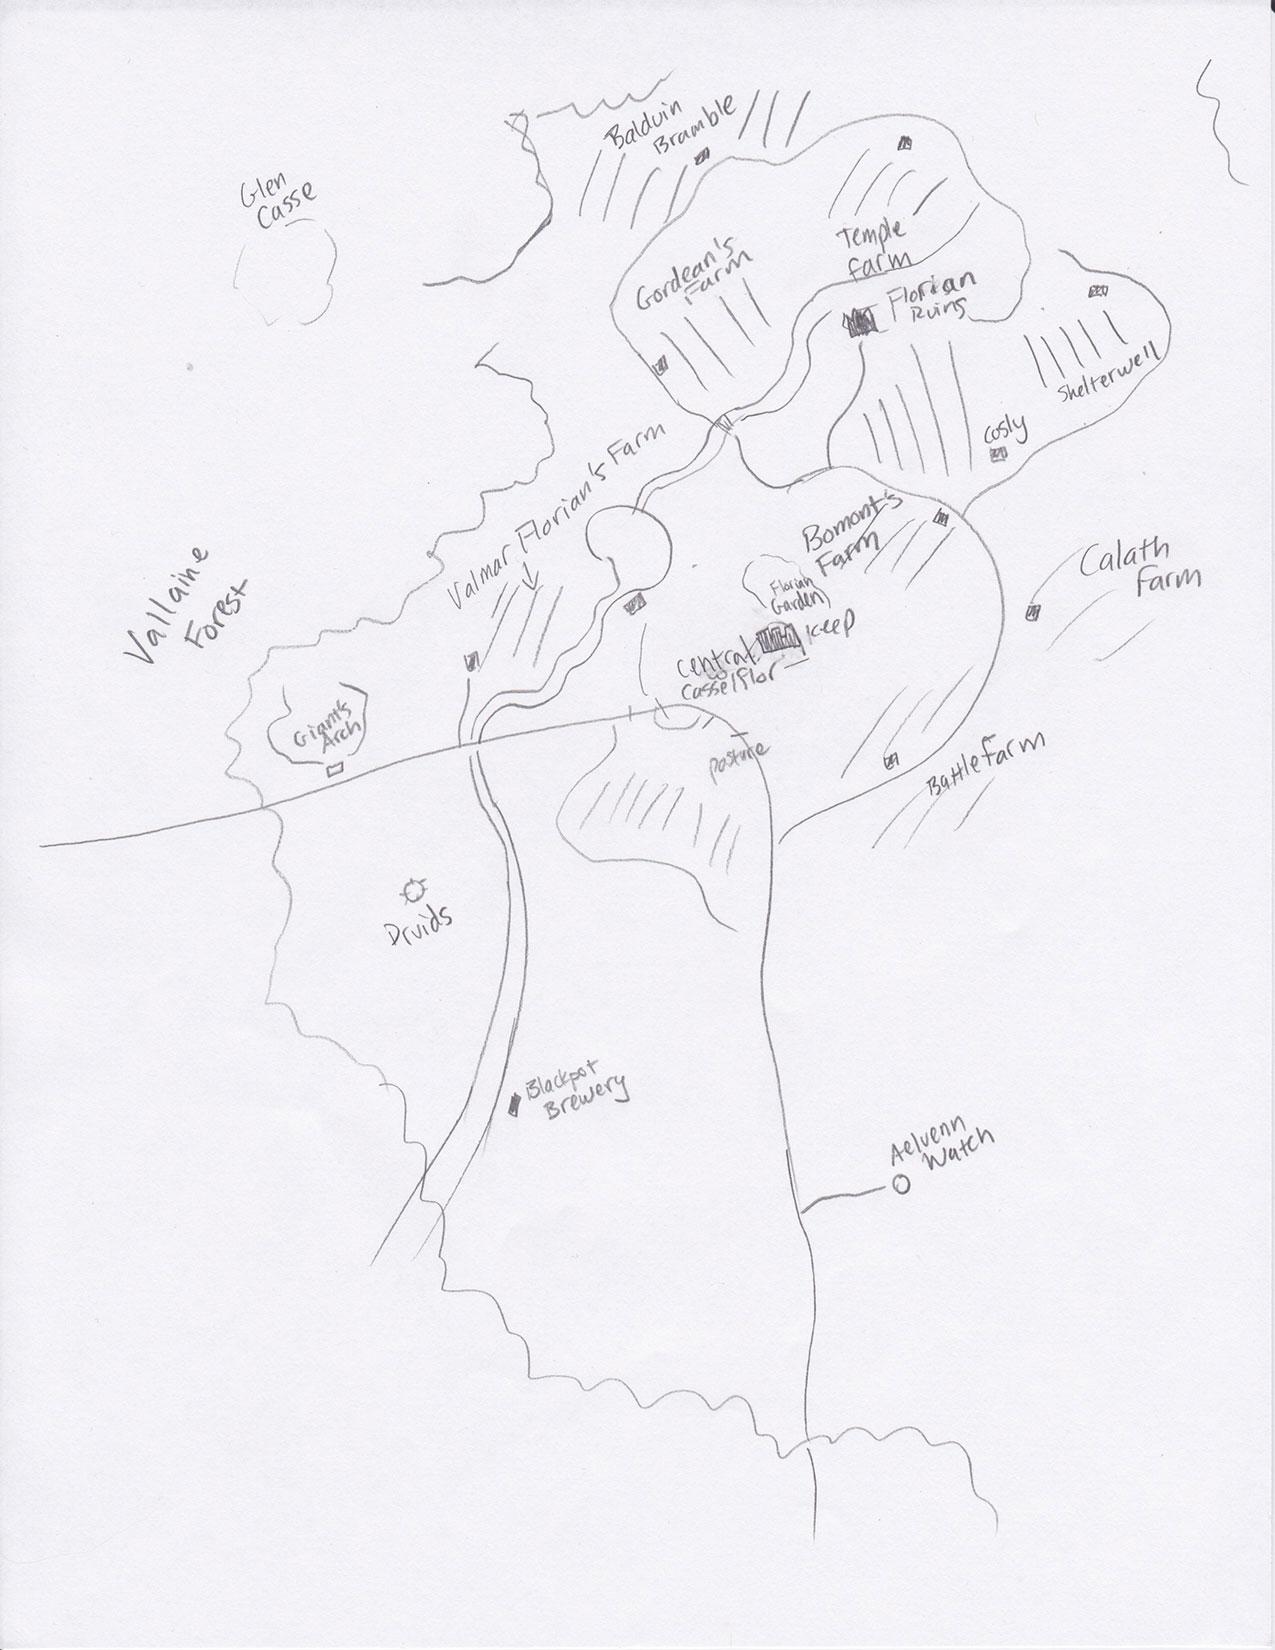 Casselflor region